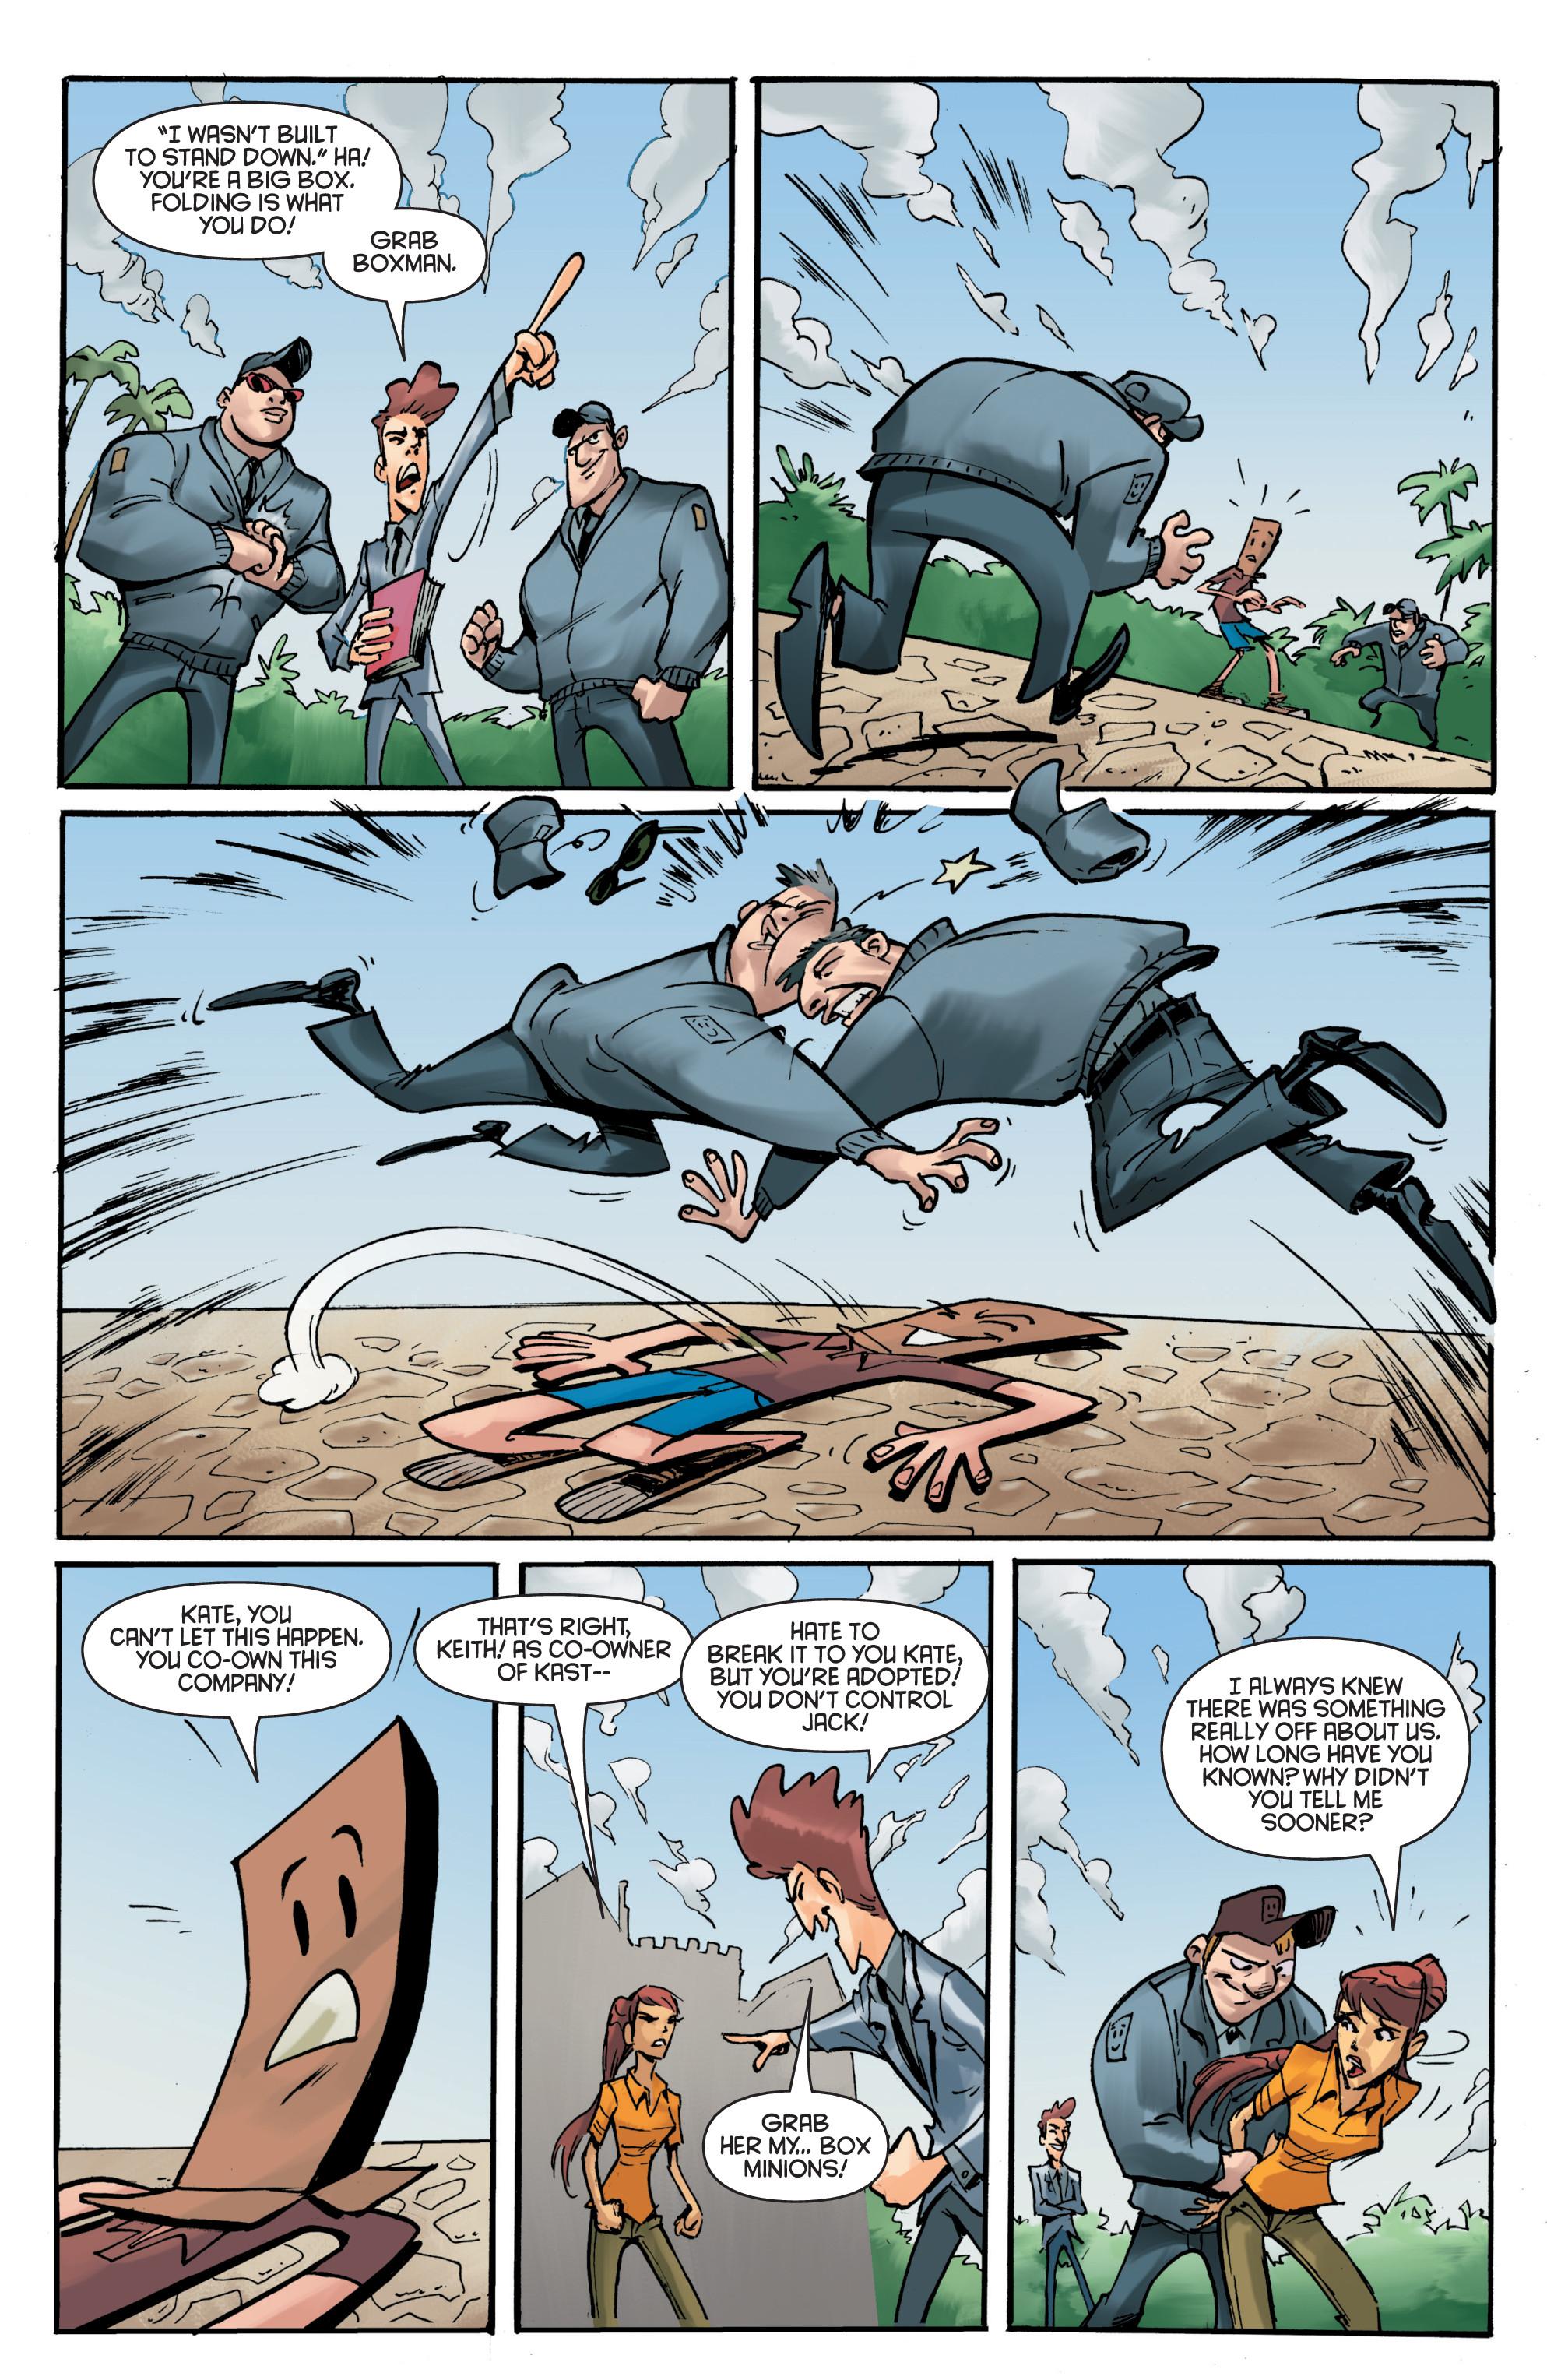 Read online Smosh comic -  Issue #5 - 19